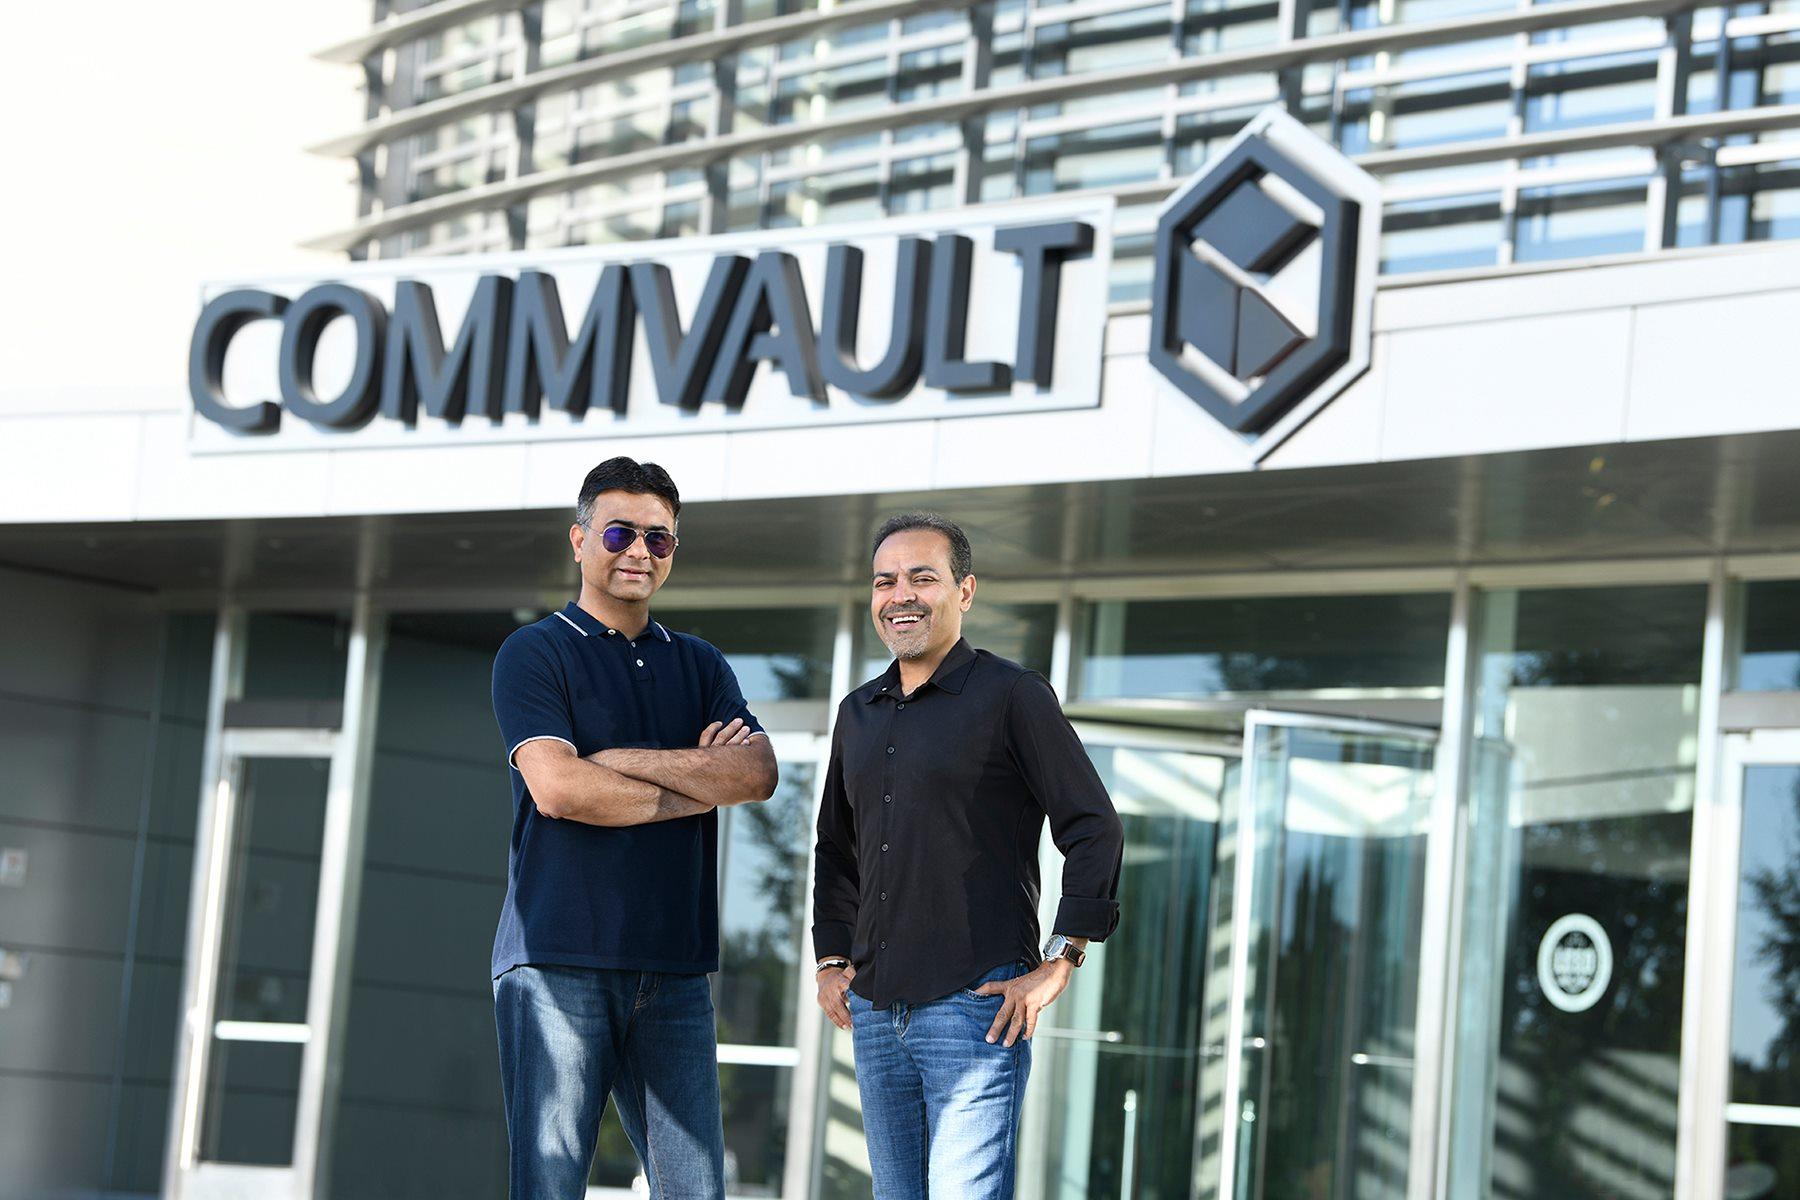 Commvault העולמית רוכשת את Hedvig כדי להאיץ את החזון האסטרטגי שלה